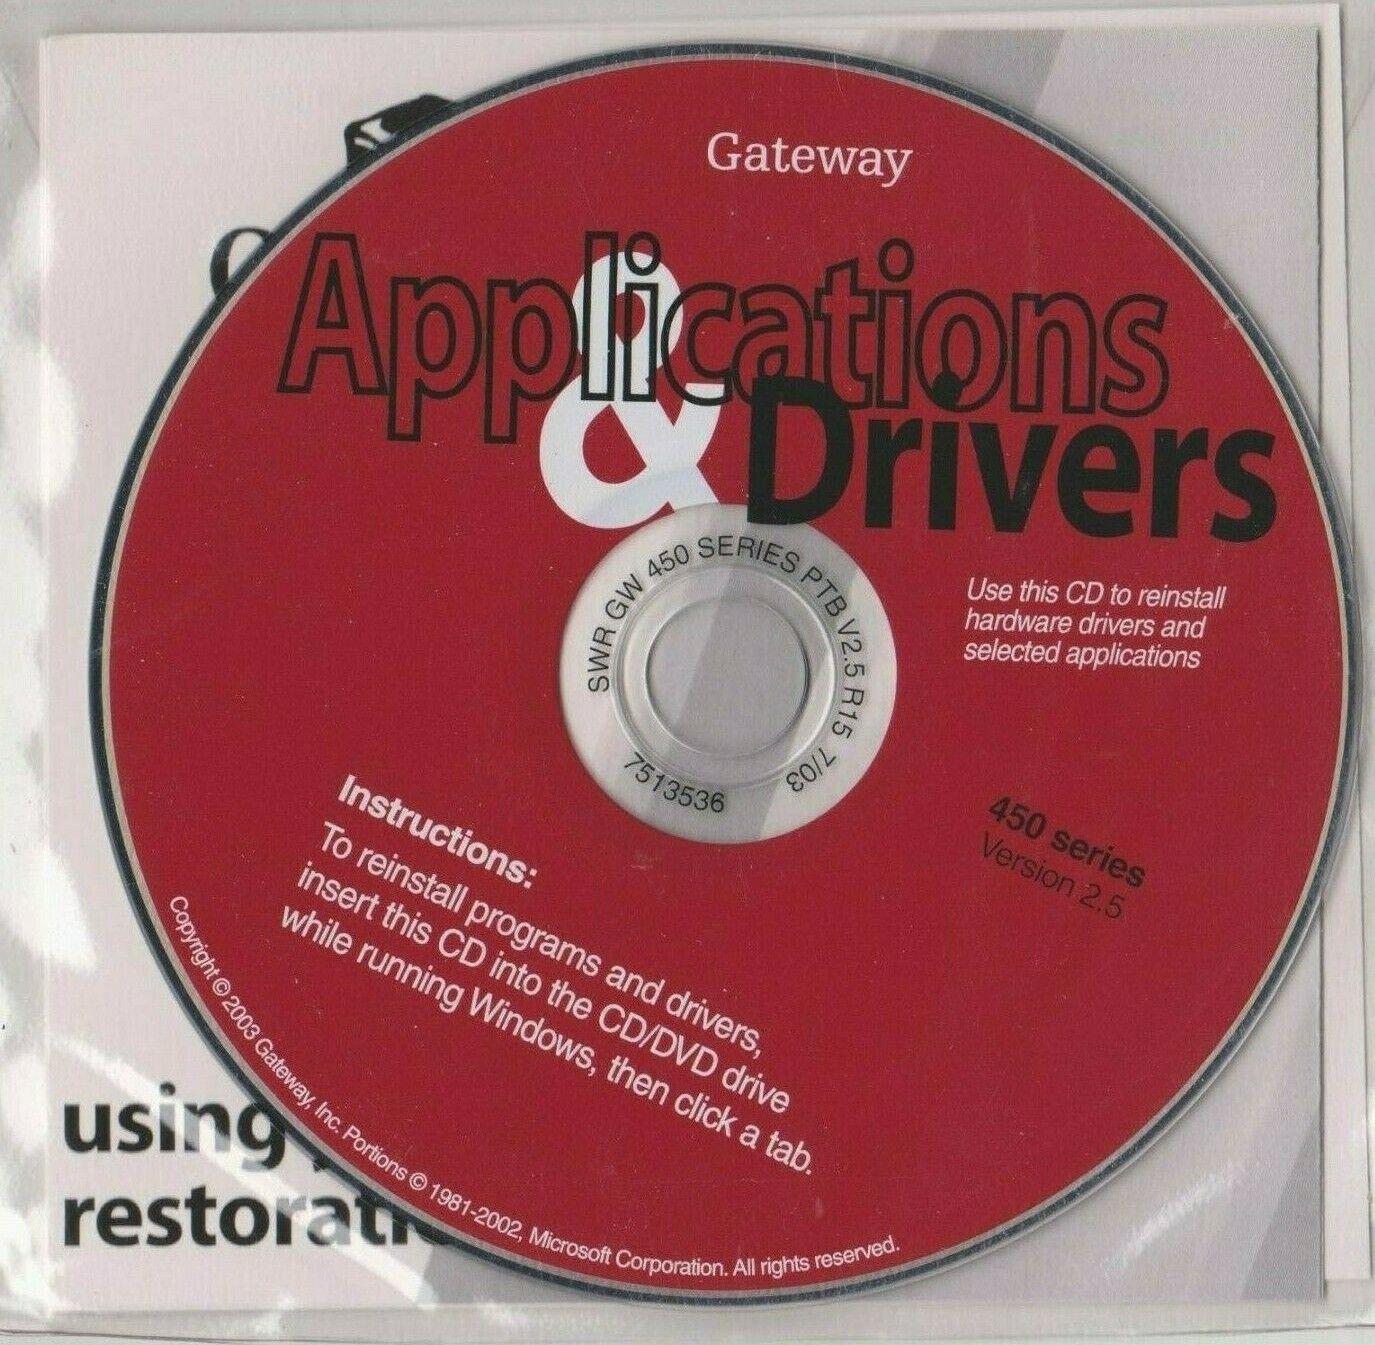 Gateway Application & Drivers 450 Series CD V2.5 7513536 Sealed